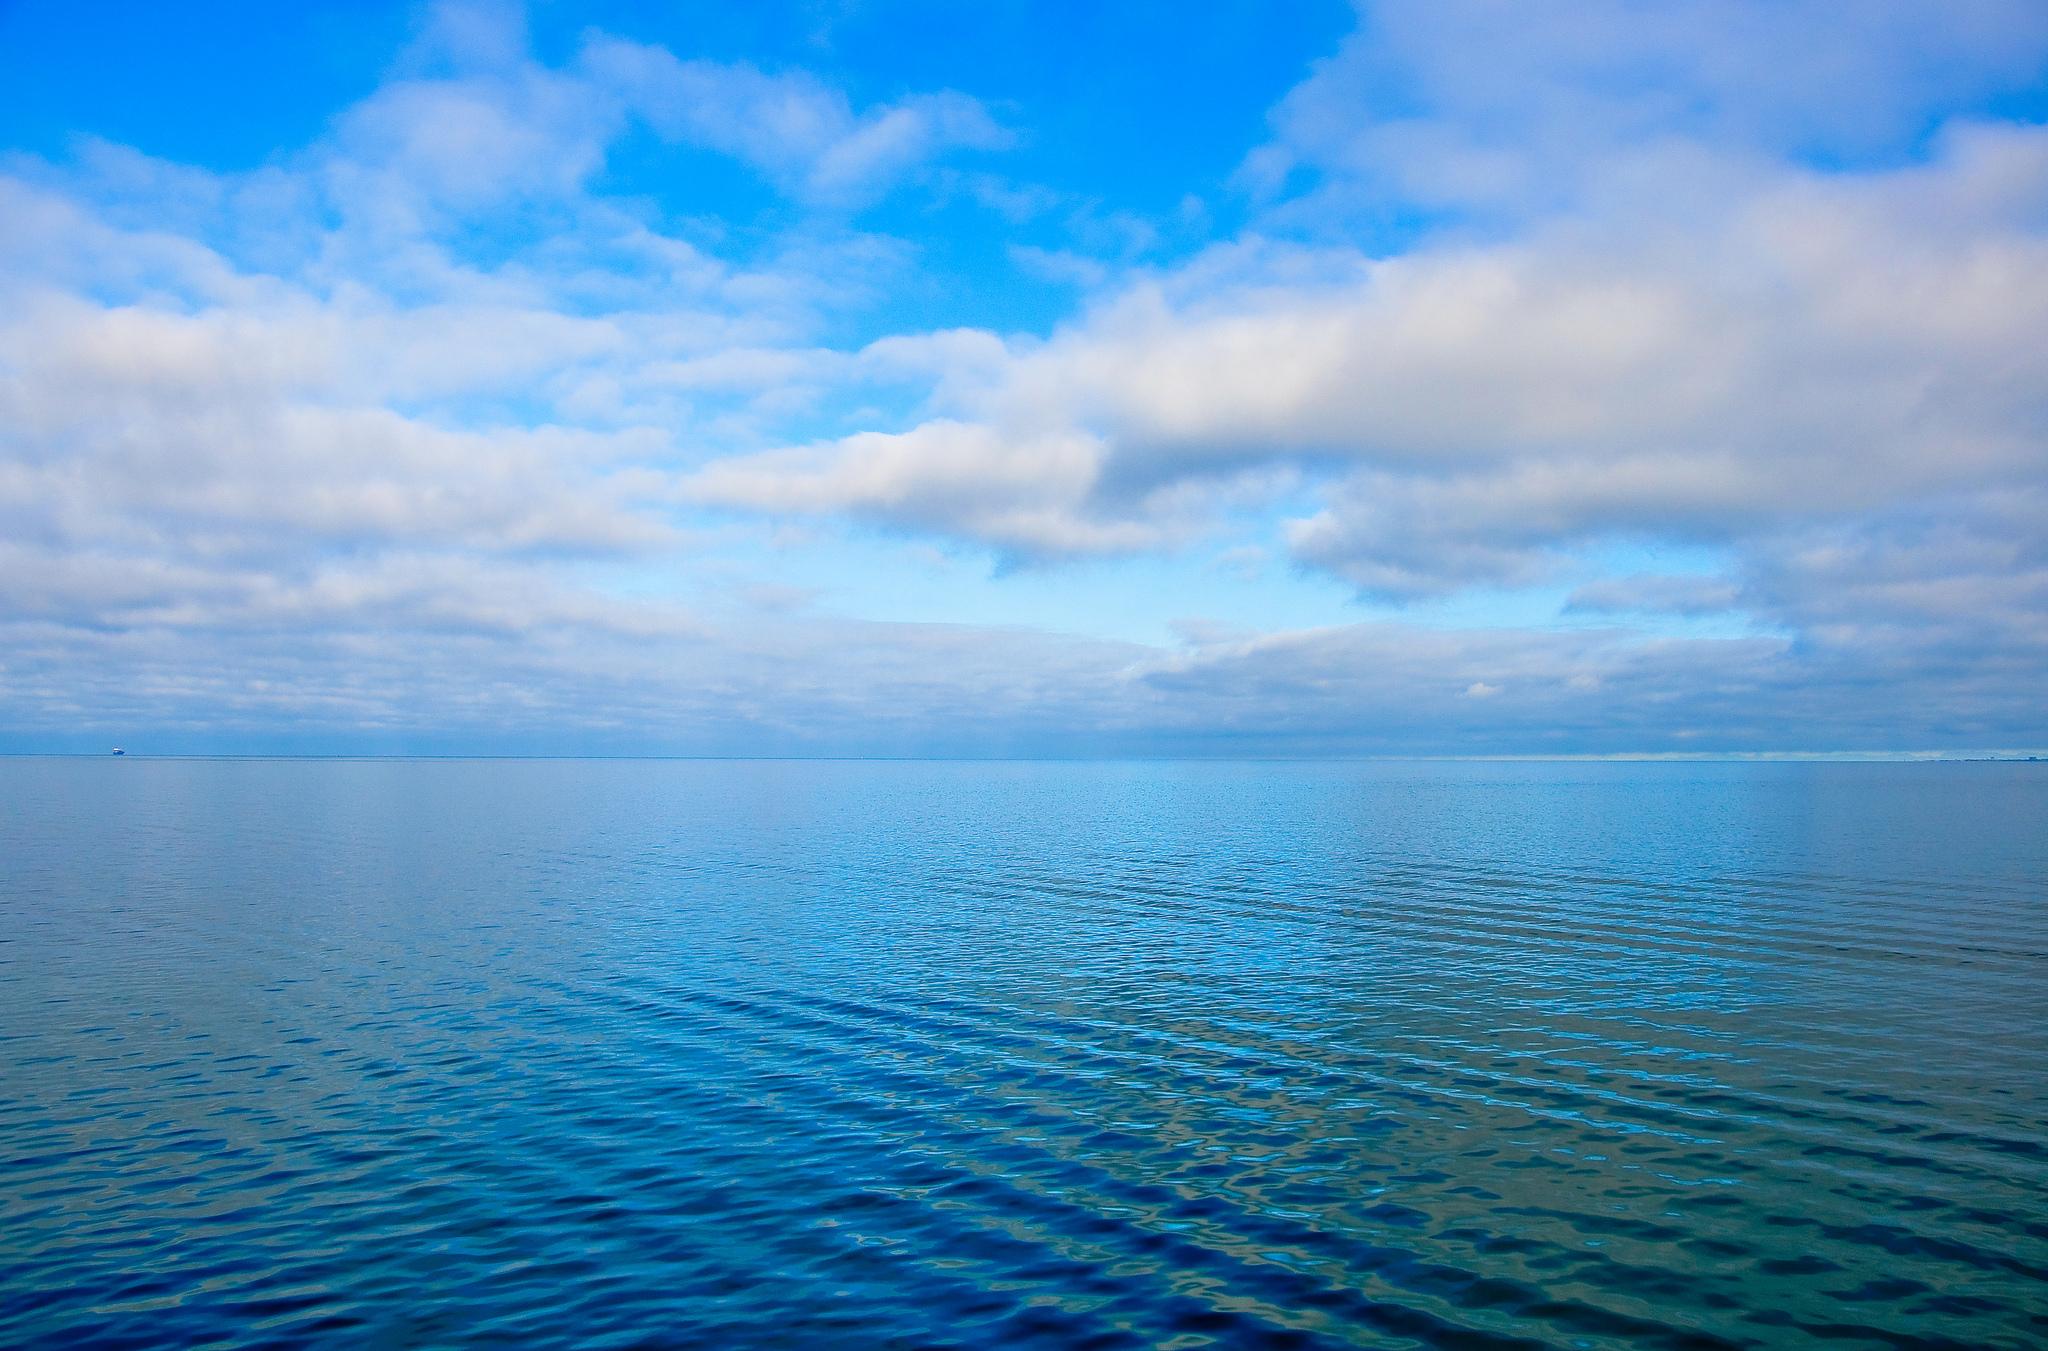 природа горизонт облака небо море nature horizon clouds the sky sea  № 2761349 загрузить